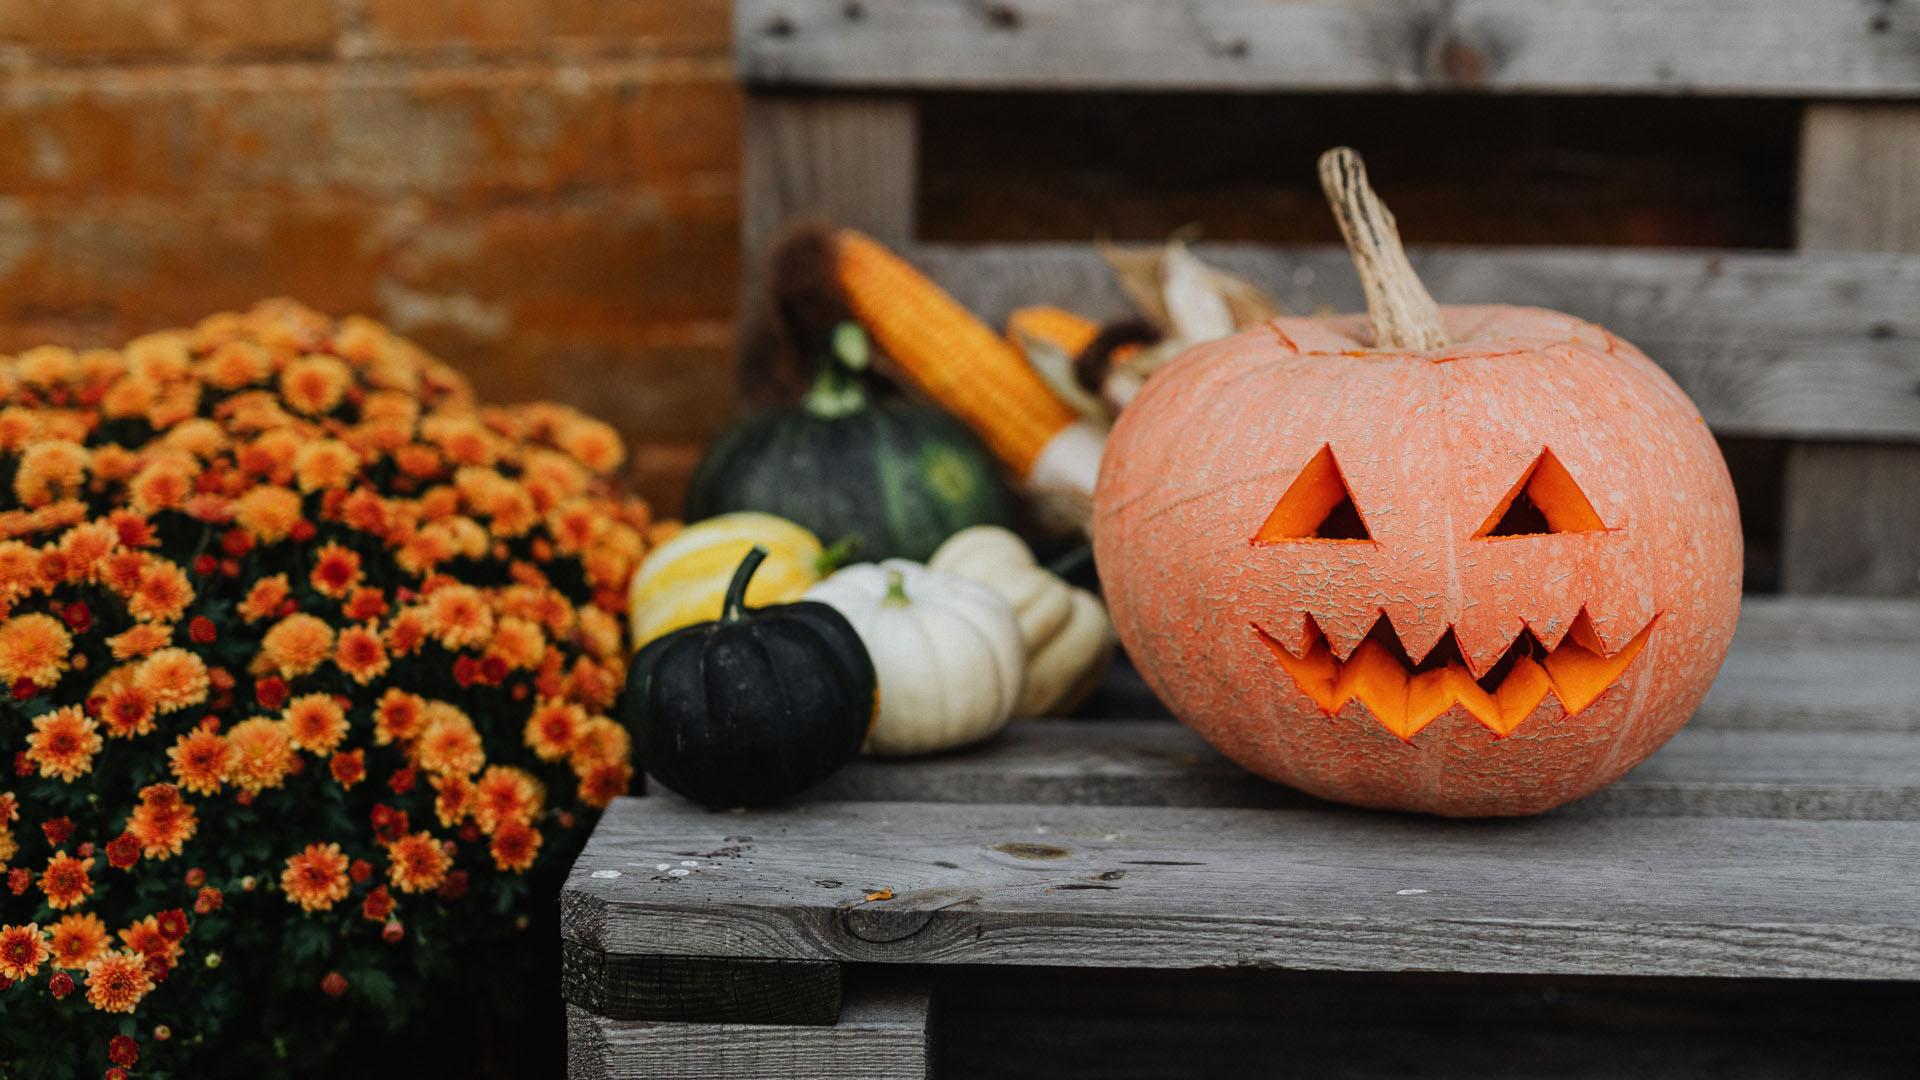 History of Halloween Pumpkin